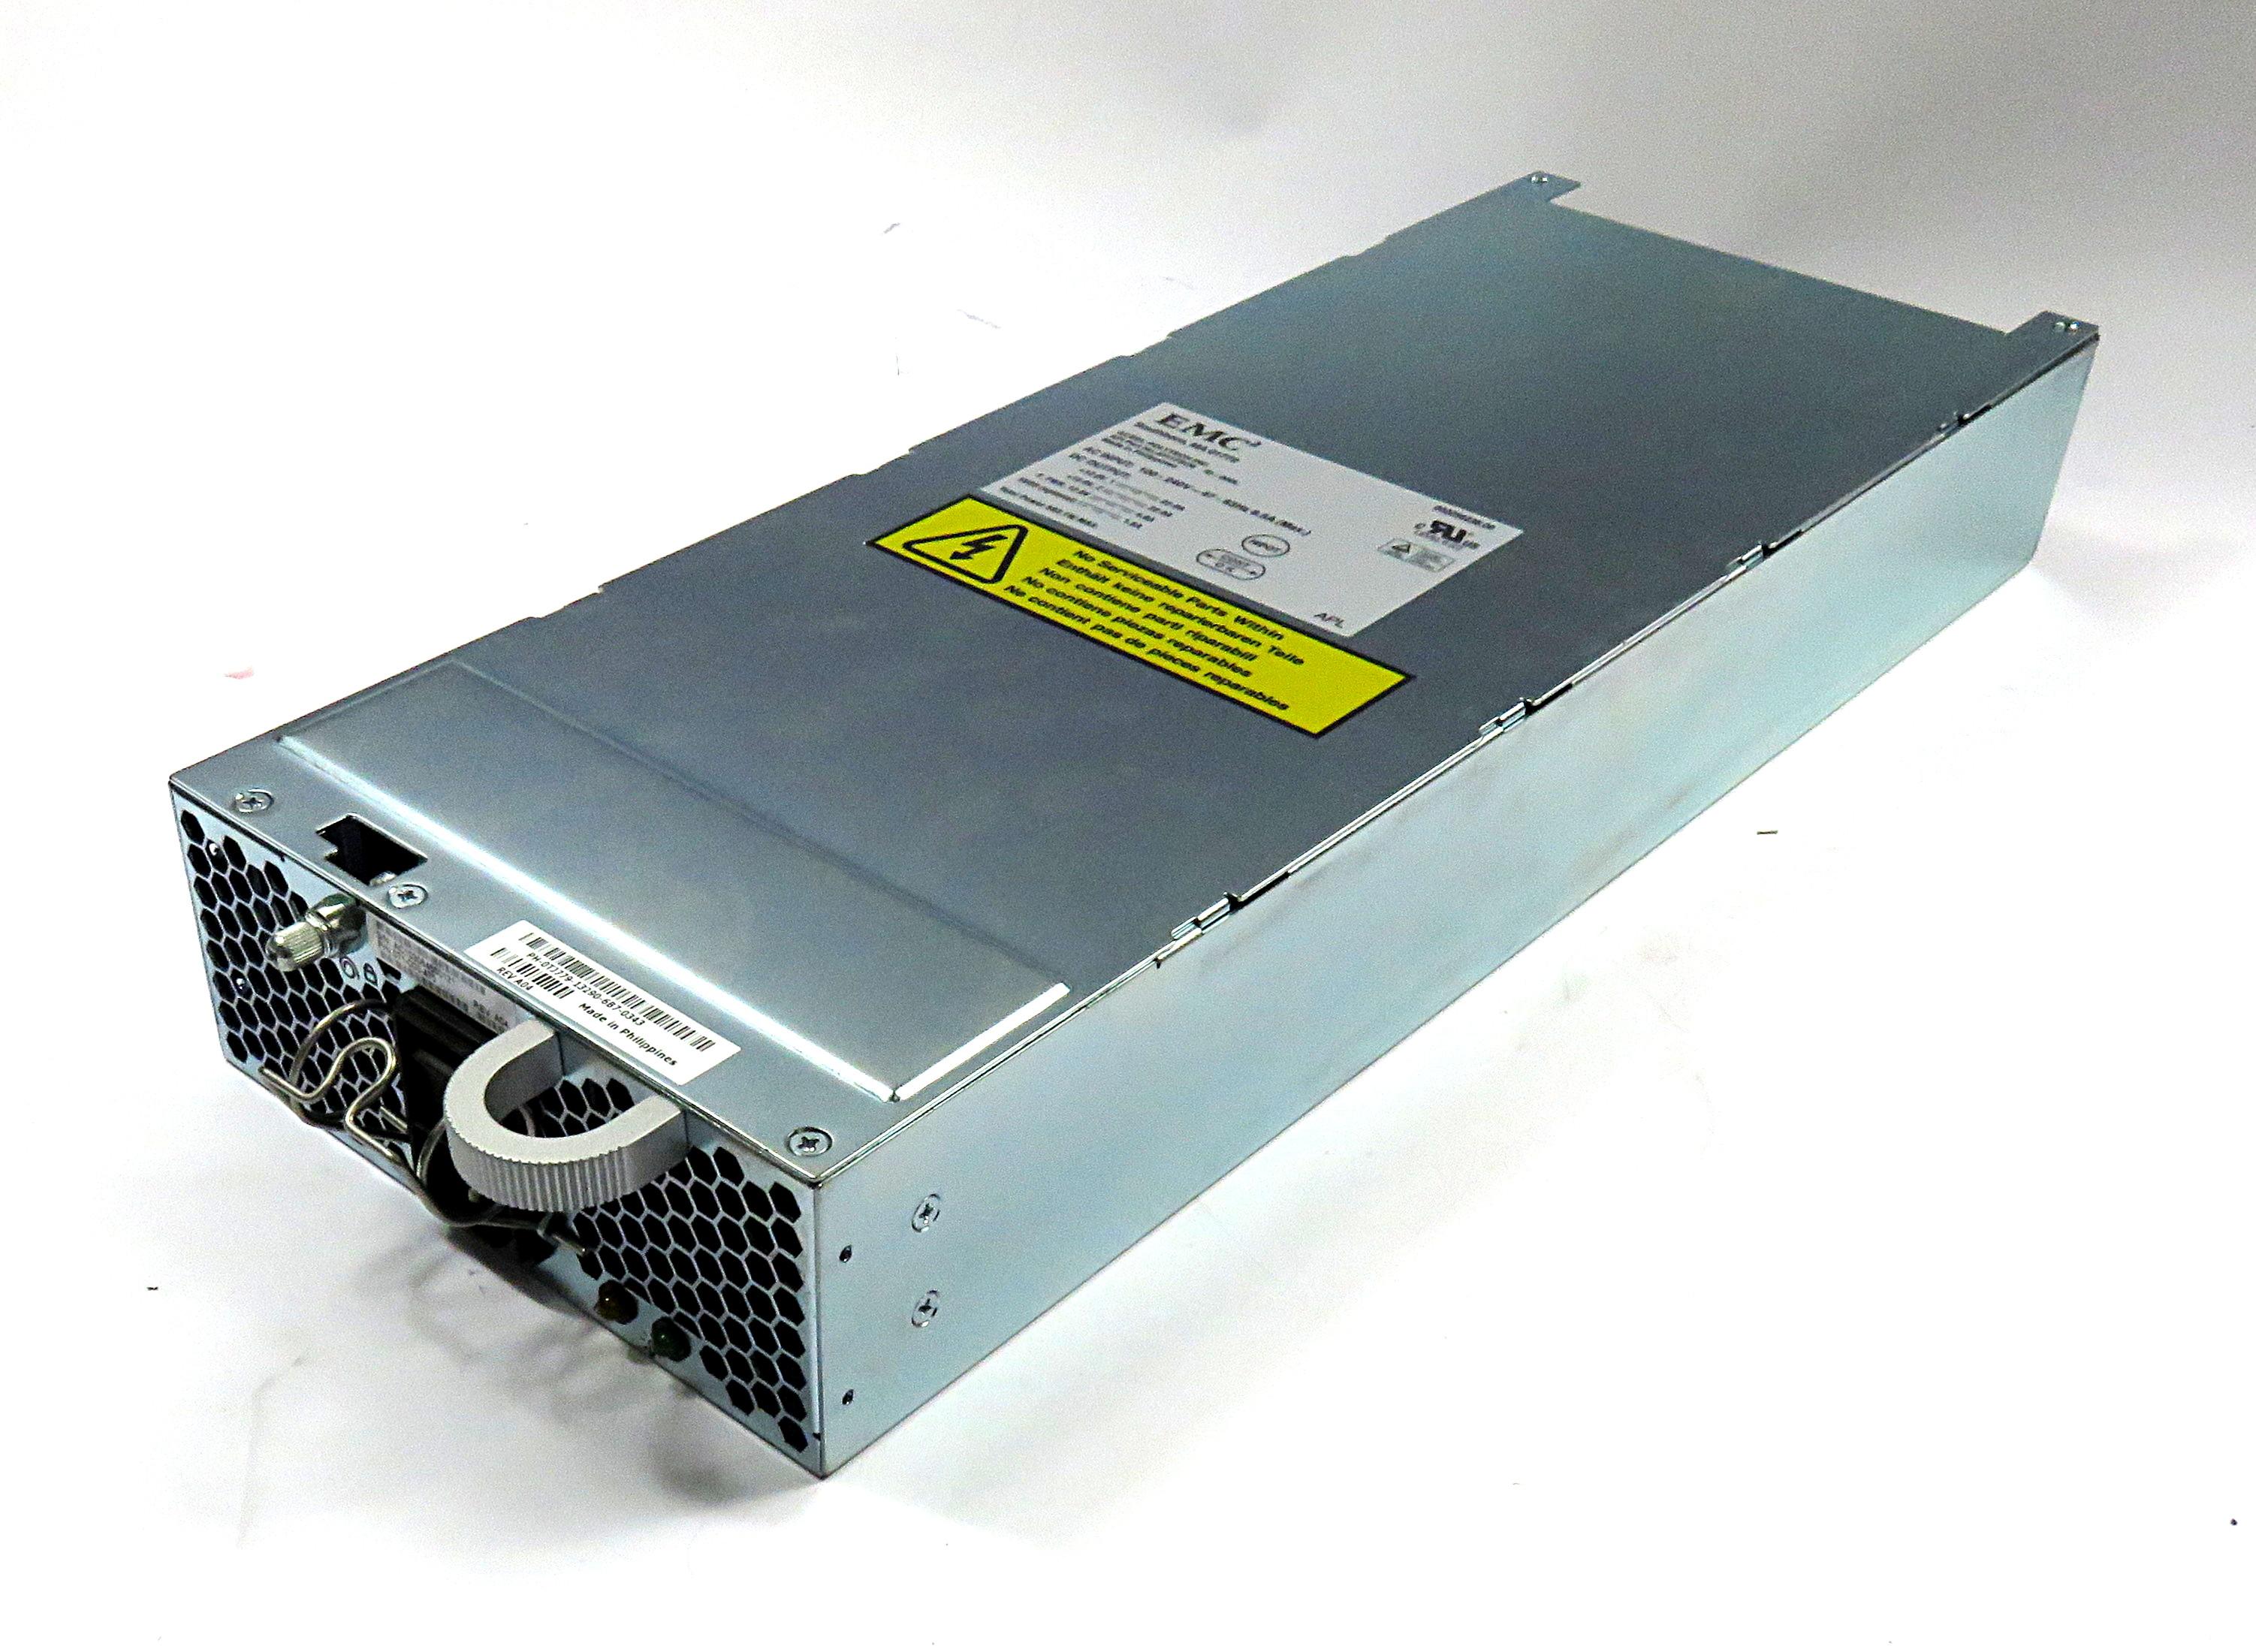 Dell TJ779 593 1W Power Supply - AcBel Polytech API1FS06